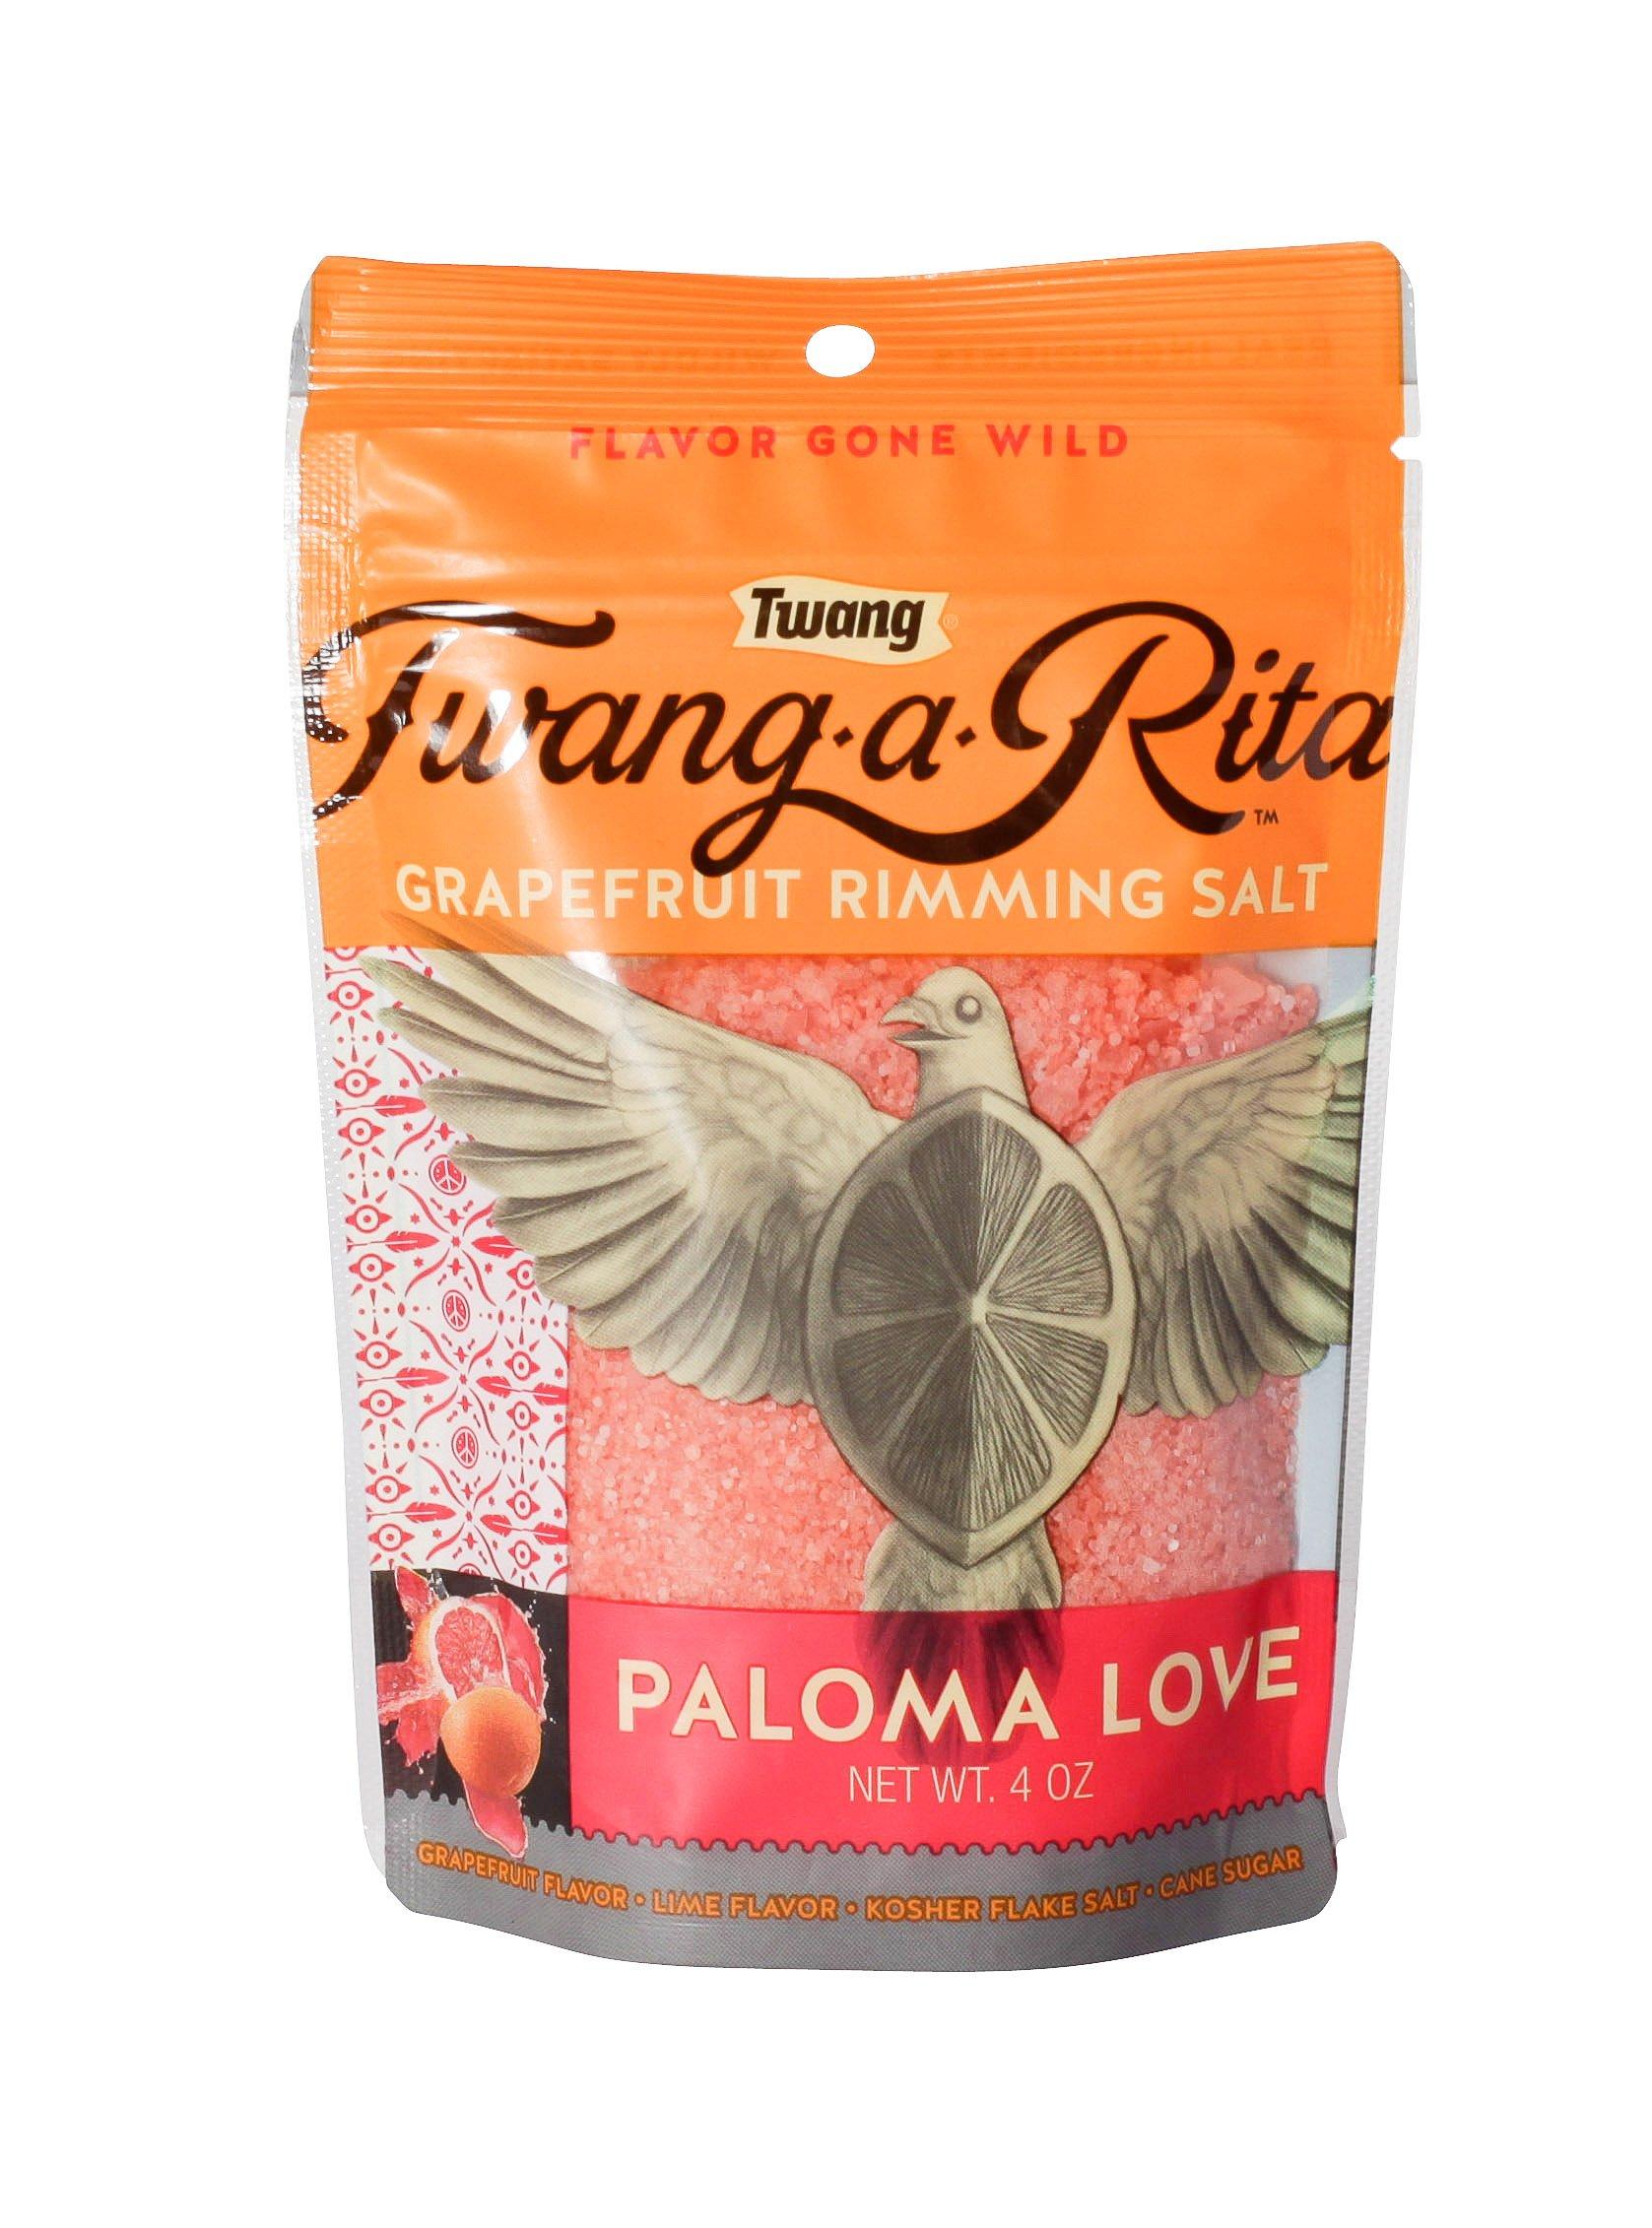 Twang-a-Rita Rimming Salt Varieties - 4 ounce pouch - (2 pack) (Paloma Love (Grapefruit)) by Twang (Image #1)